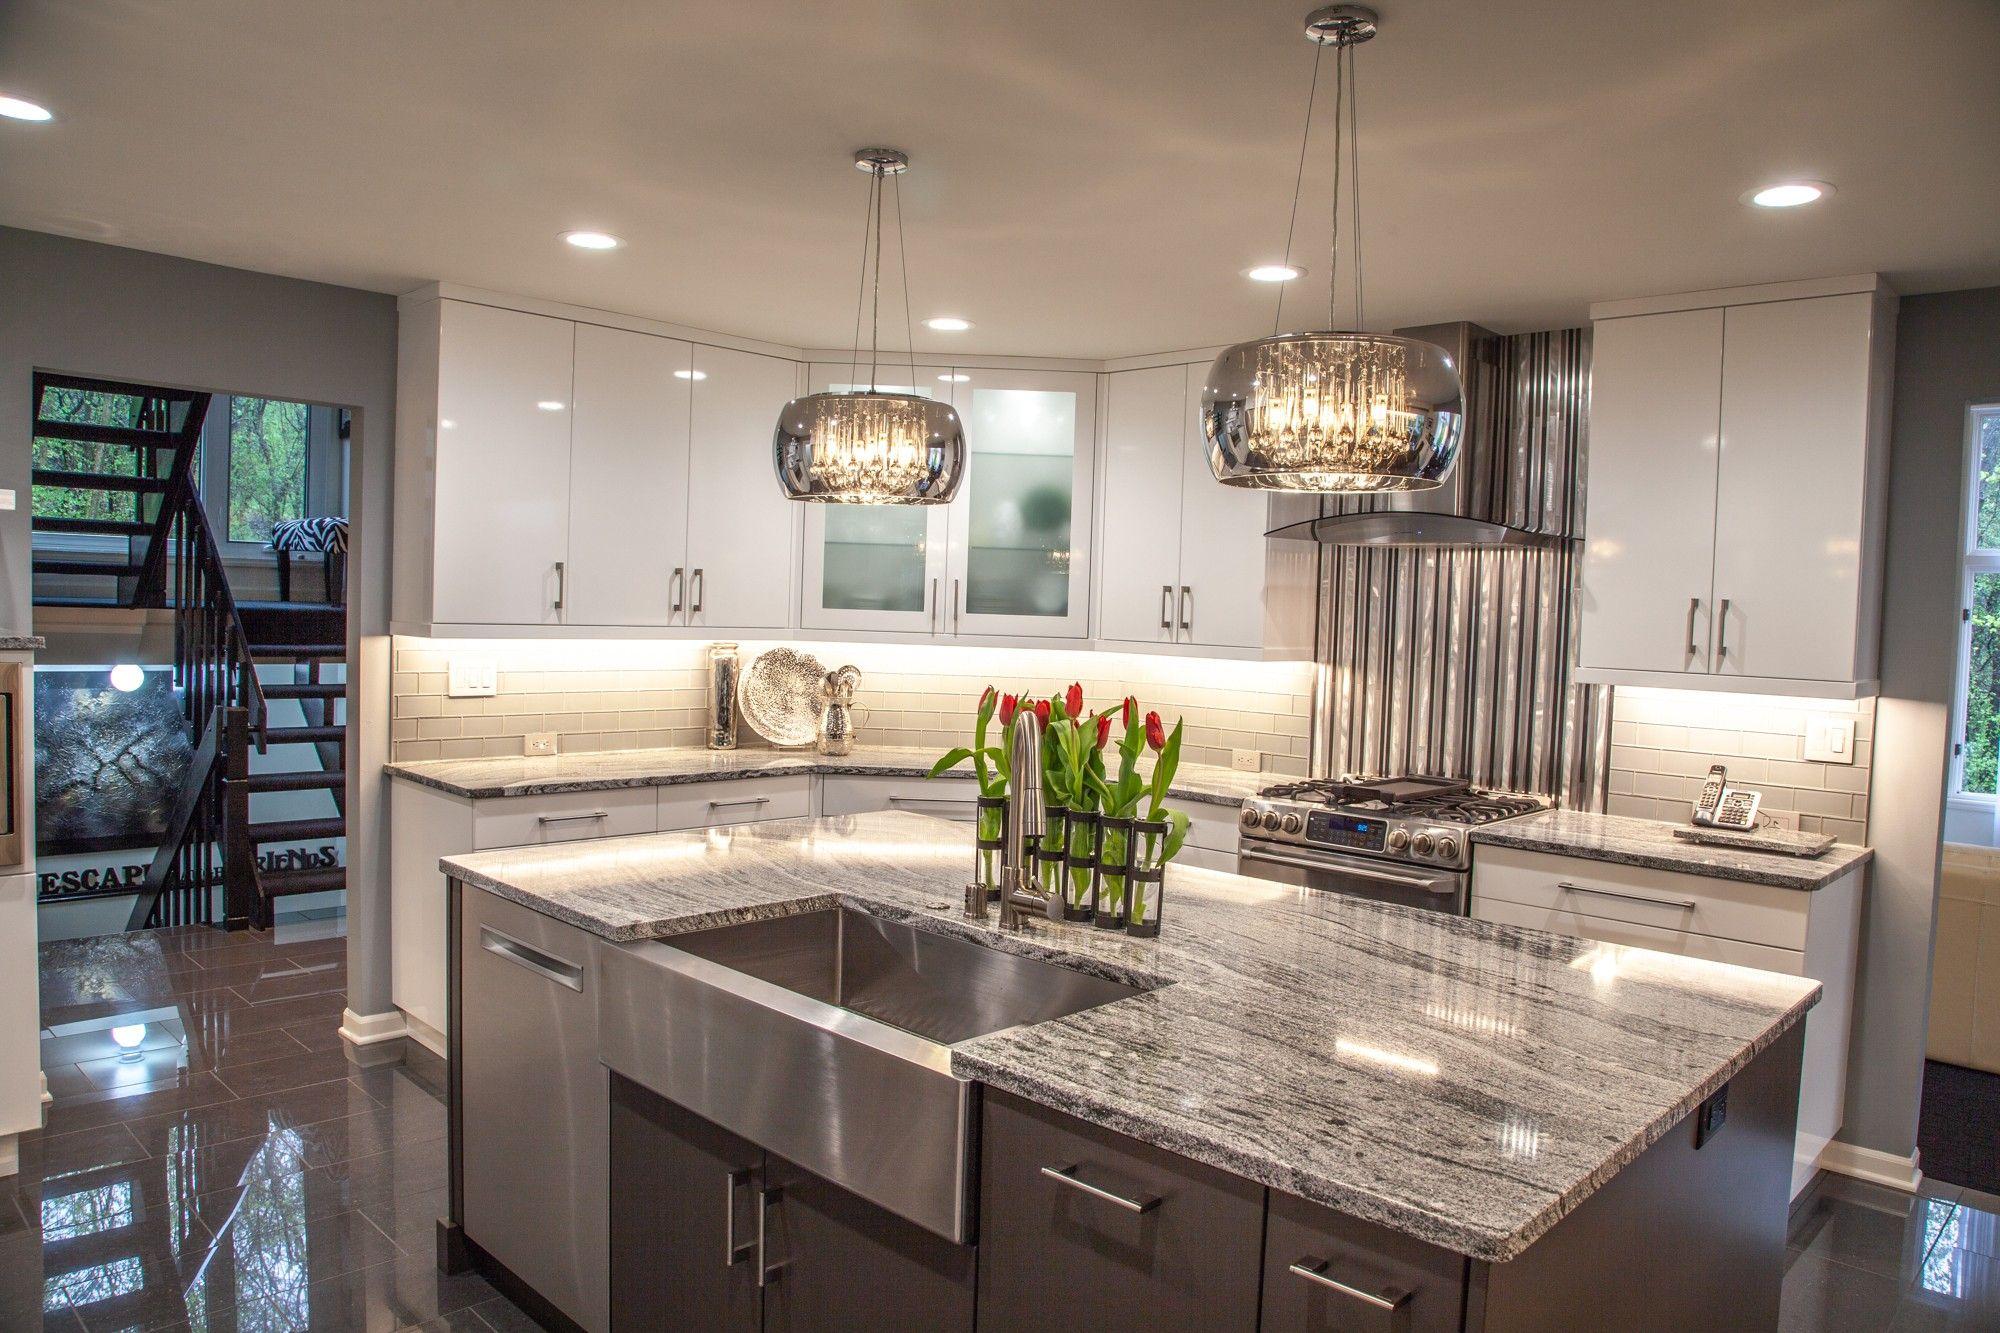 Pin by Linda Yan on Great Design | Modern kitchen design ...